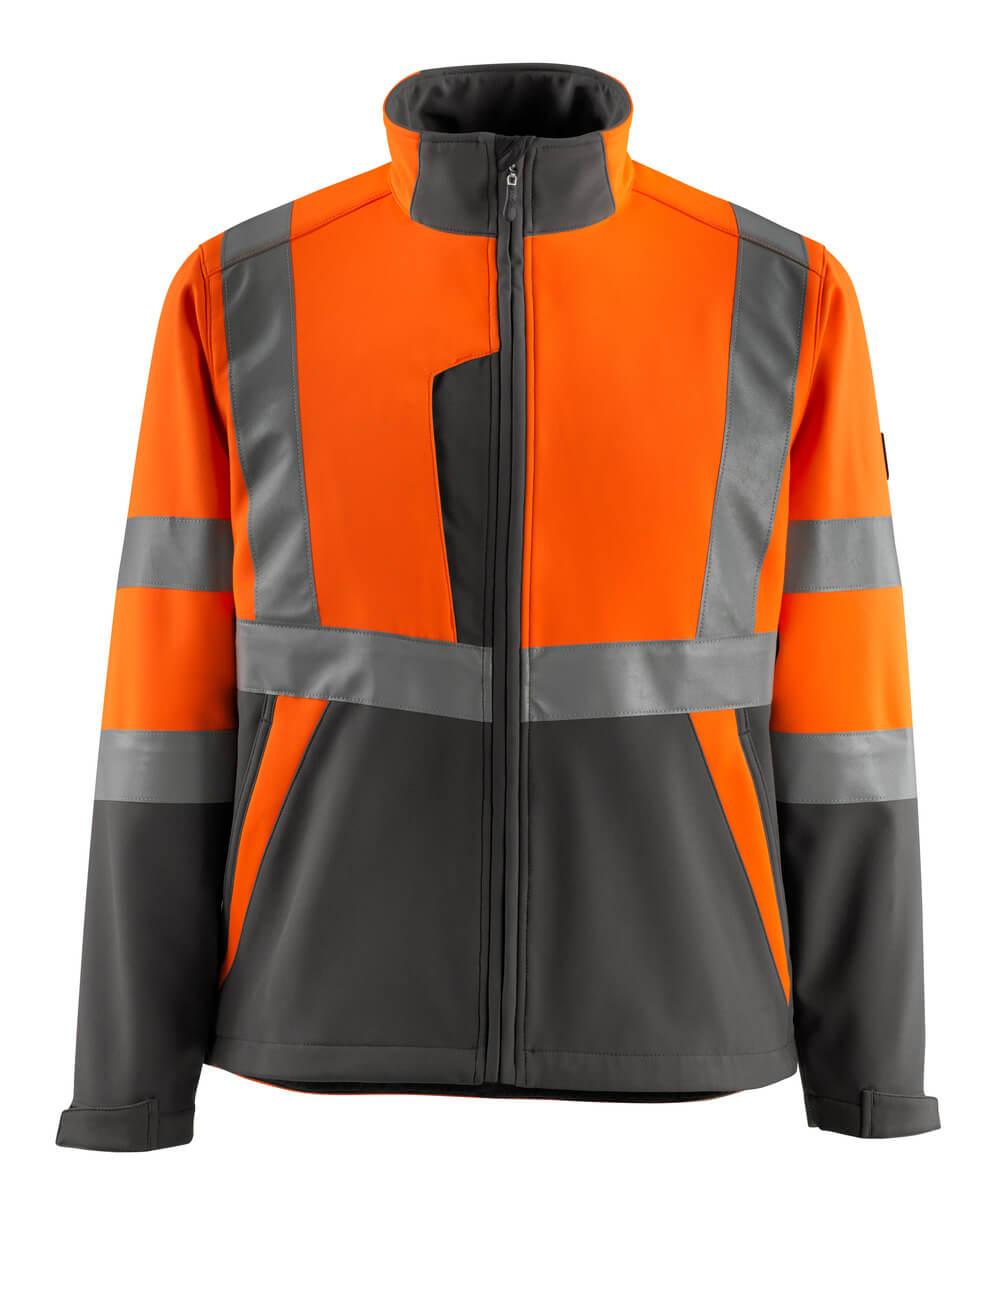 15902-253-1418 Softshell jakke - hi-vis orange/mørk antracit